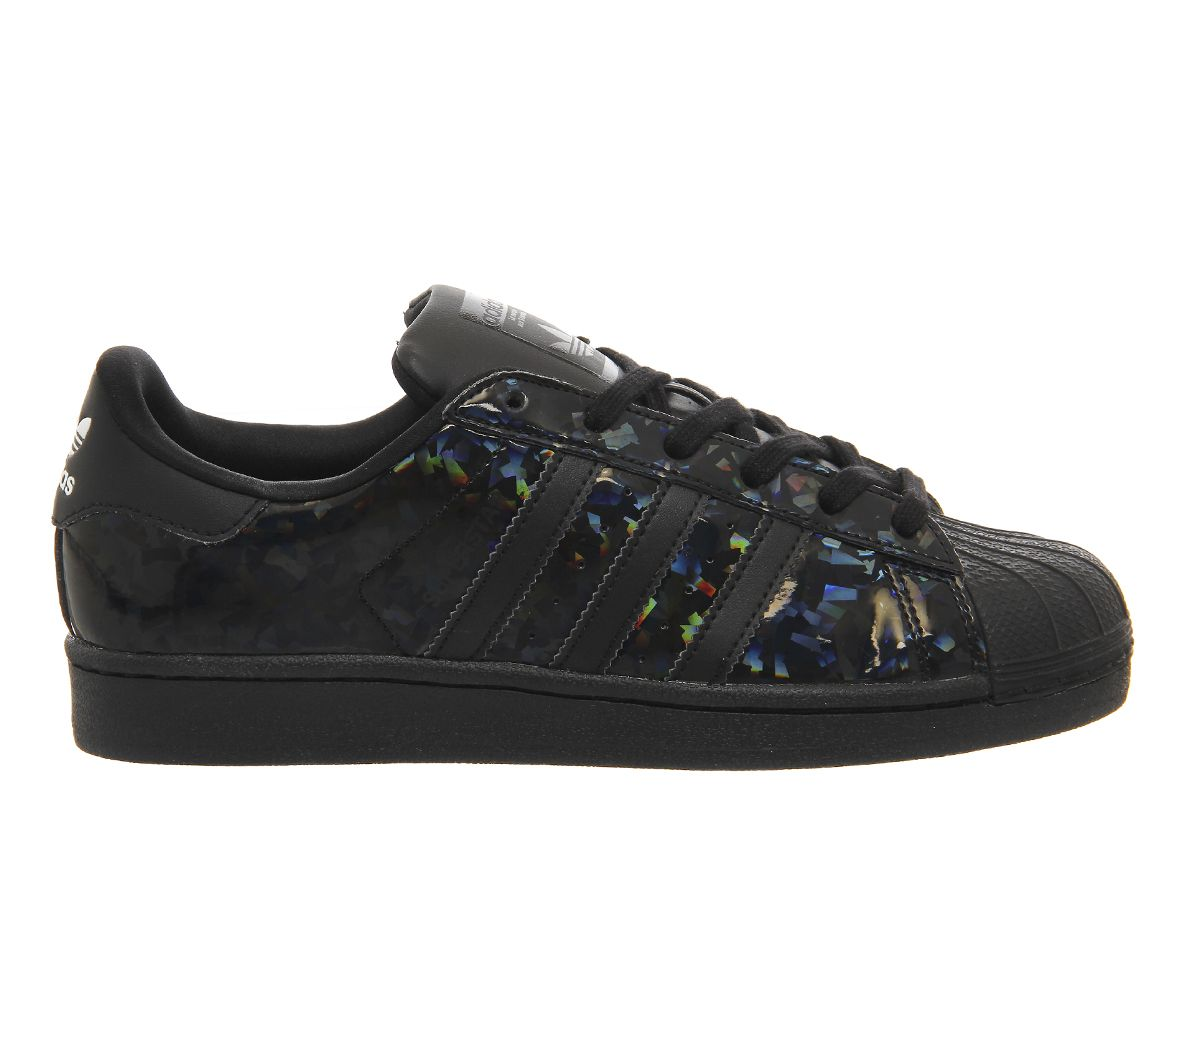 adidas Superstar 2 Holographic Black W